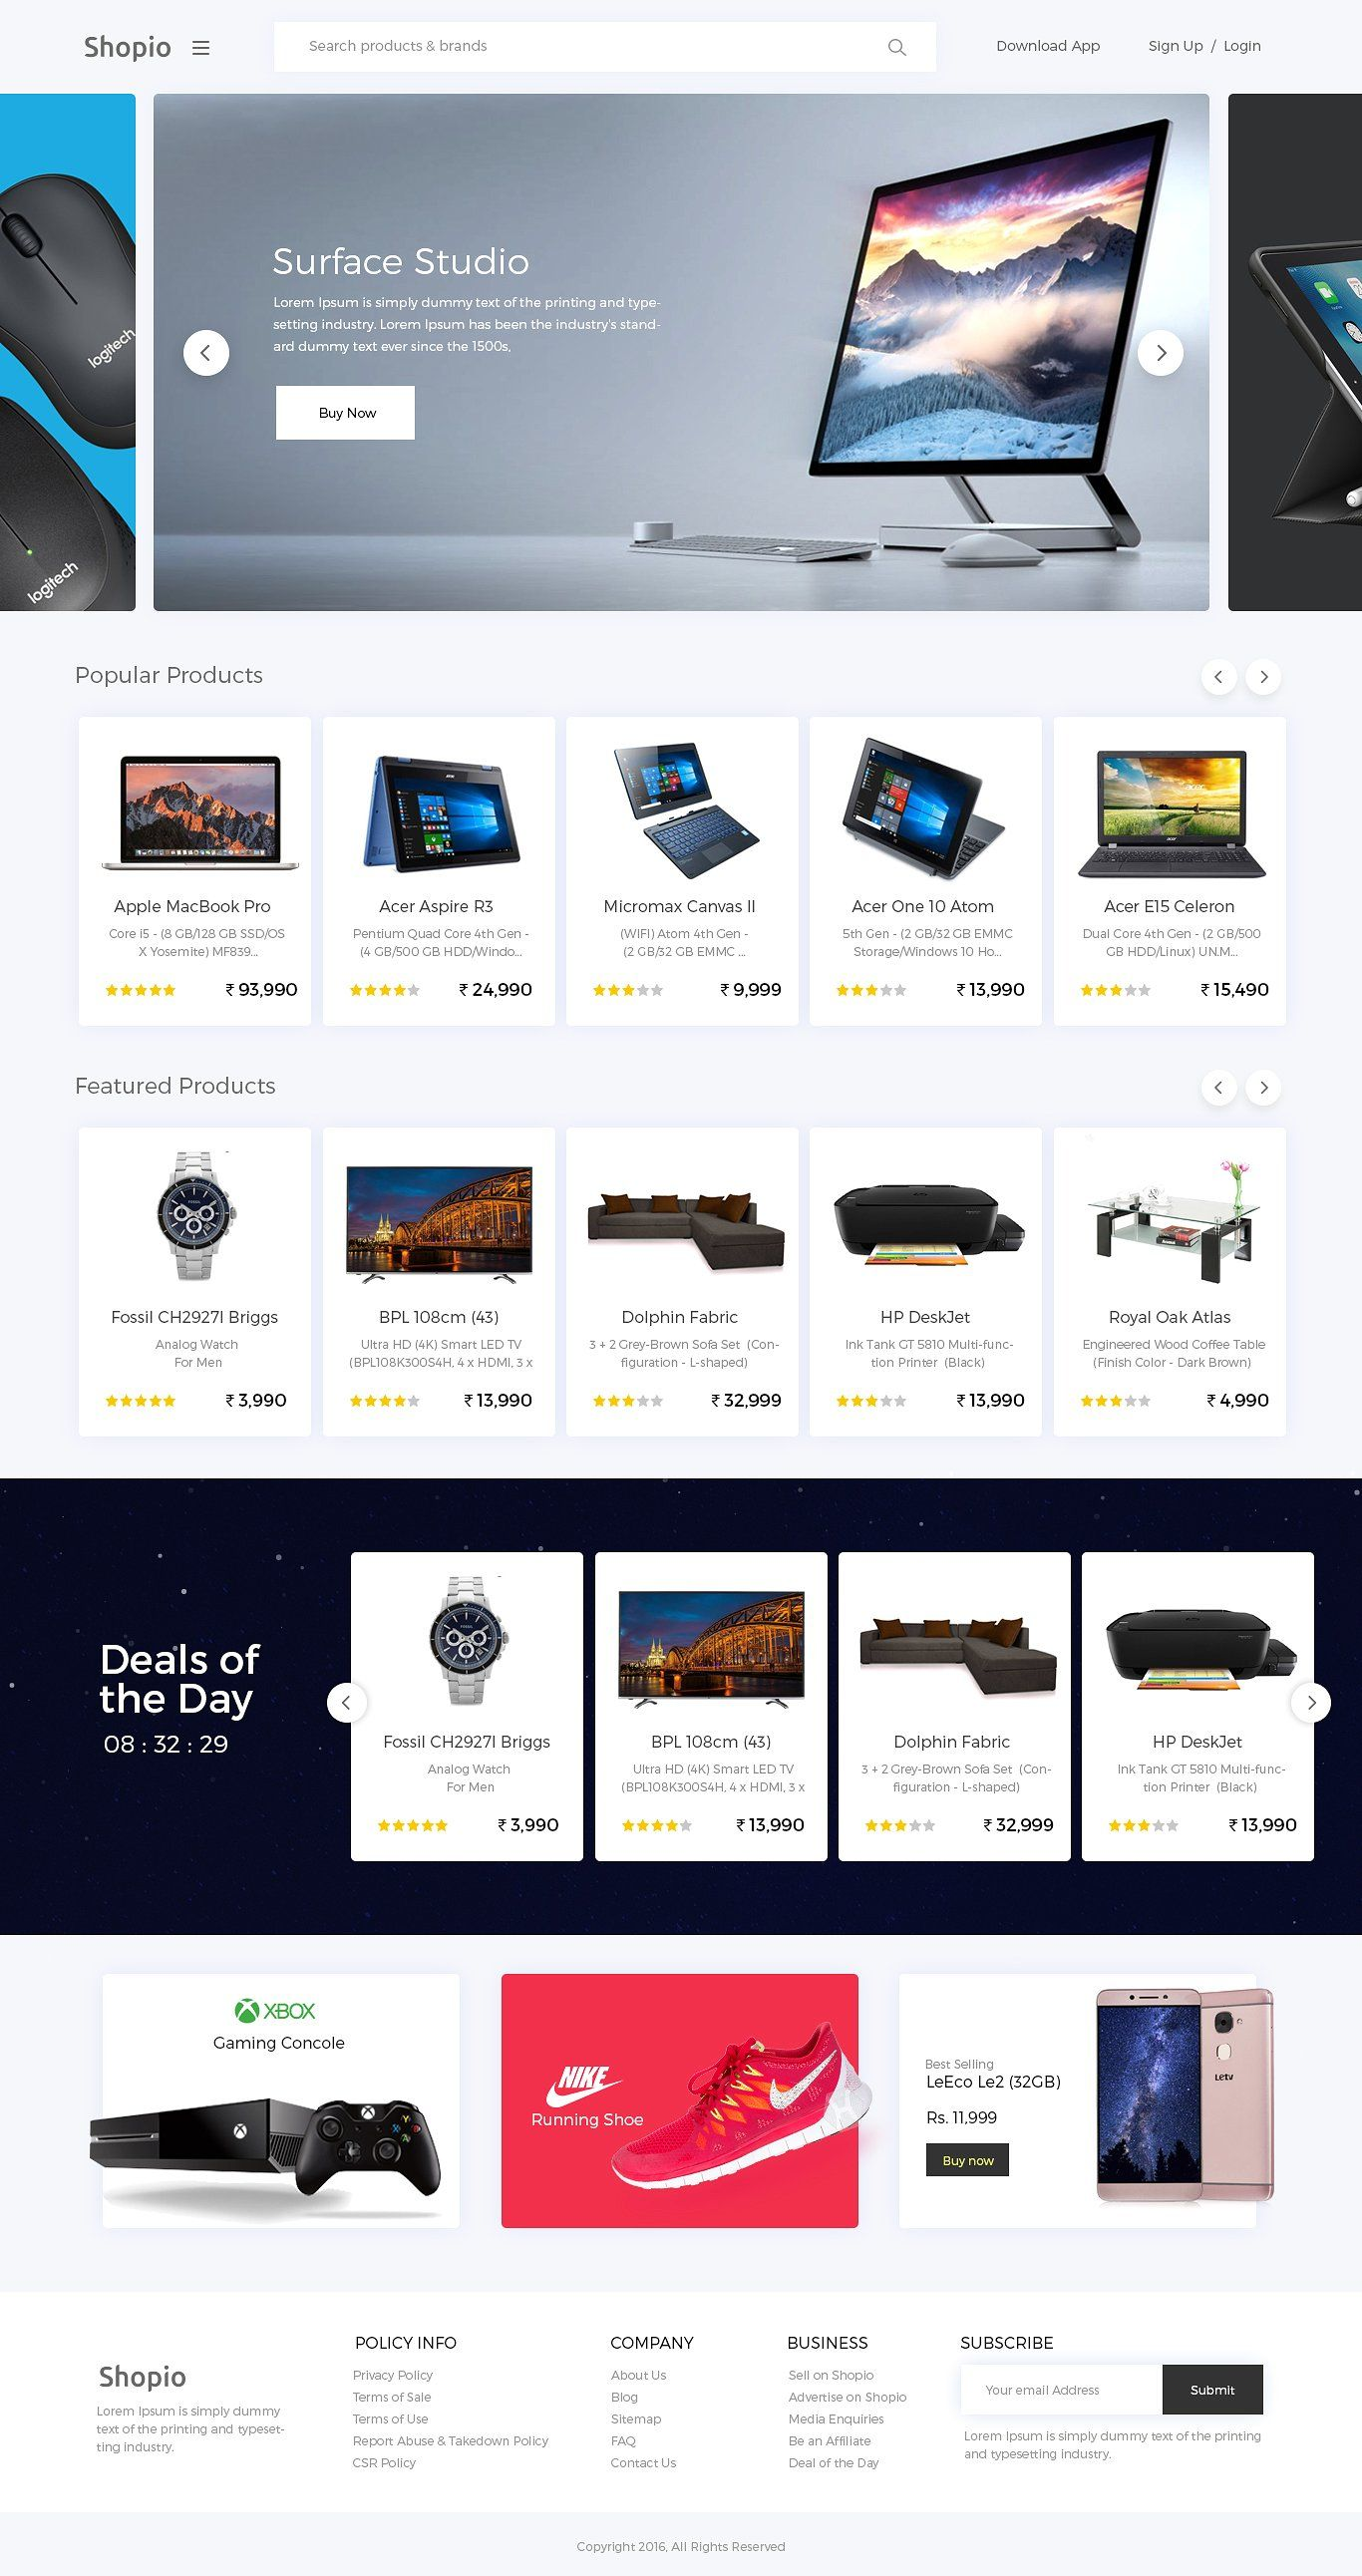 Shopio Ecommerce Psd Ecommerce Web Design Ecommerce Website Design Online Web Design